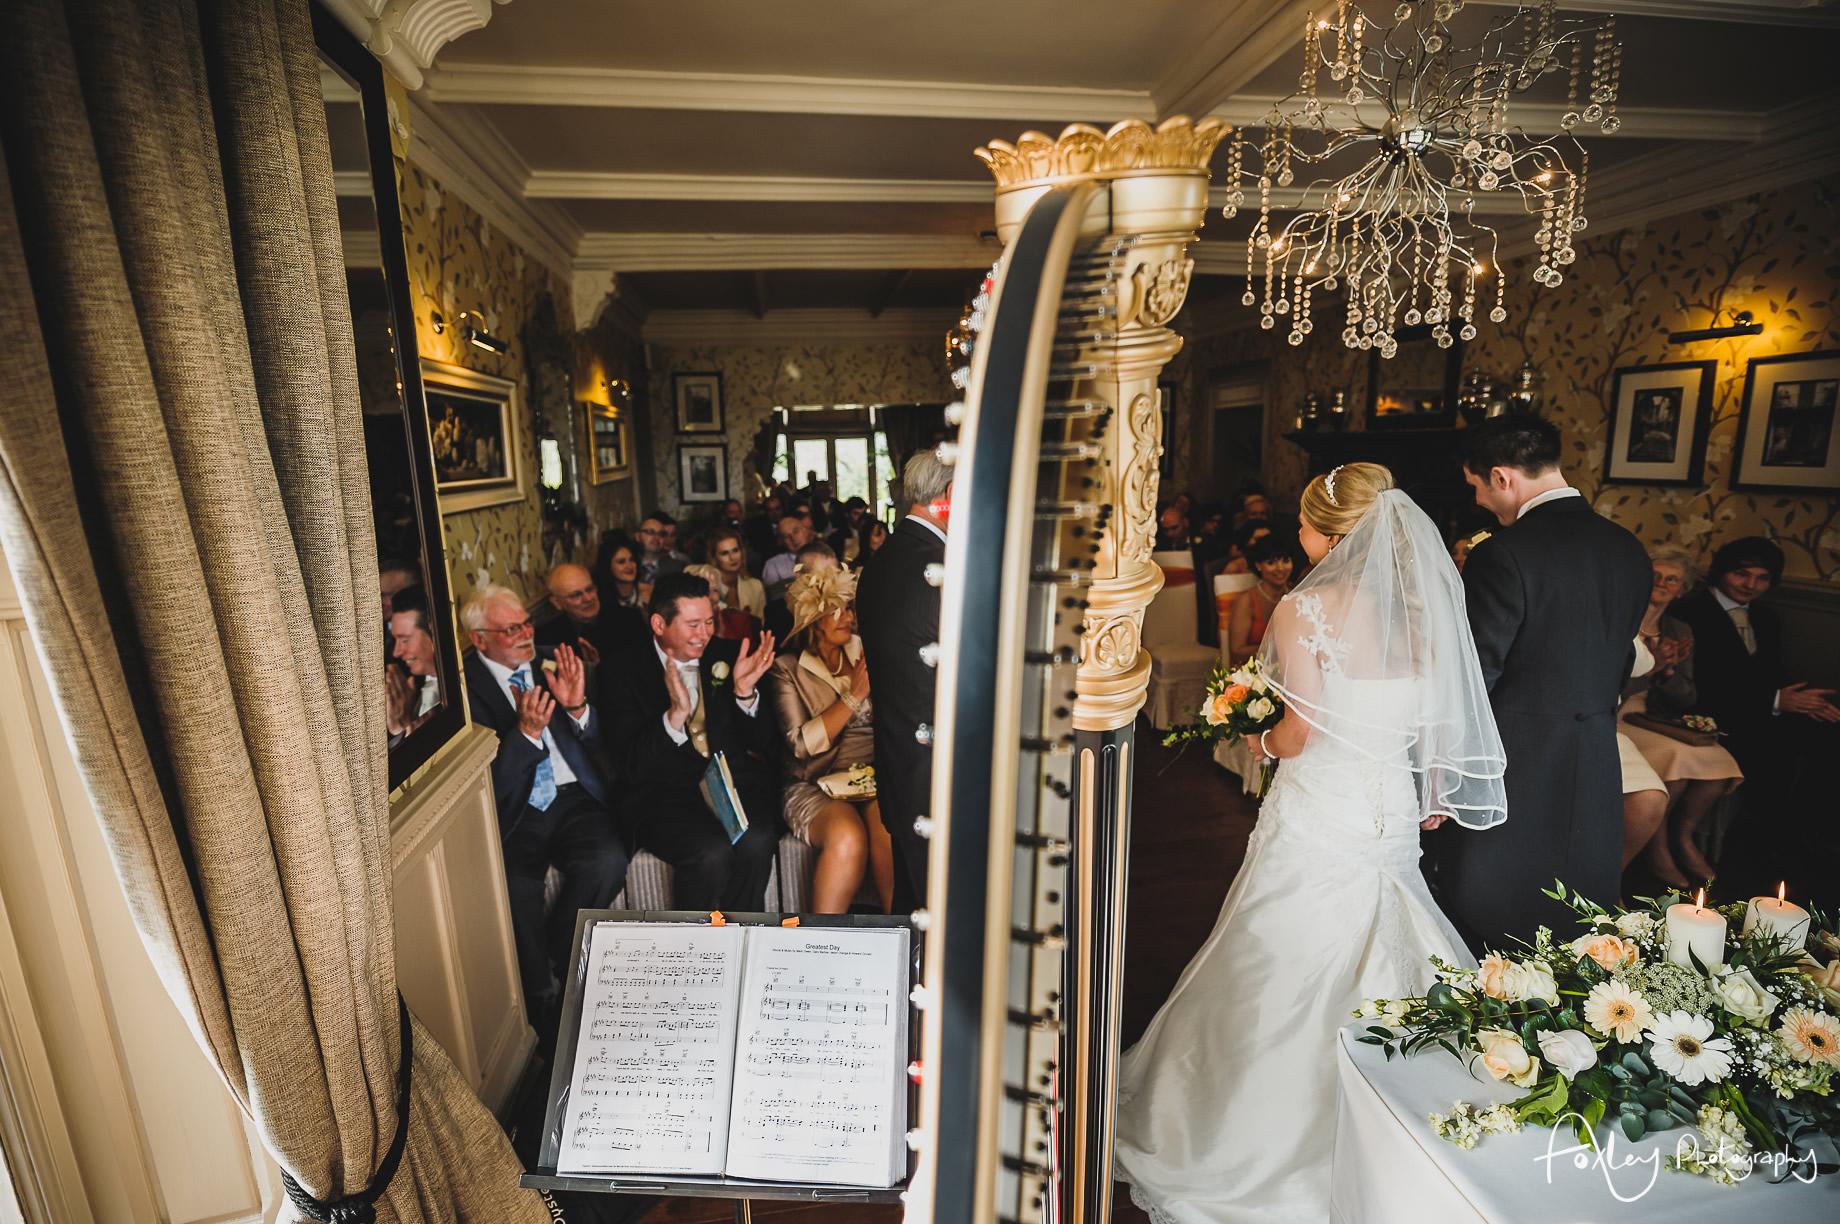 Gemma and Lewis' Wedding at Mitton Hall 086